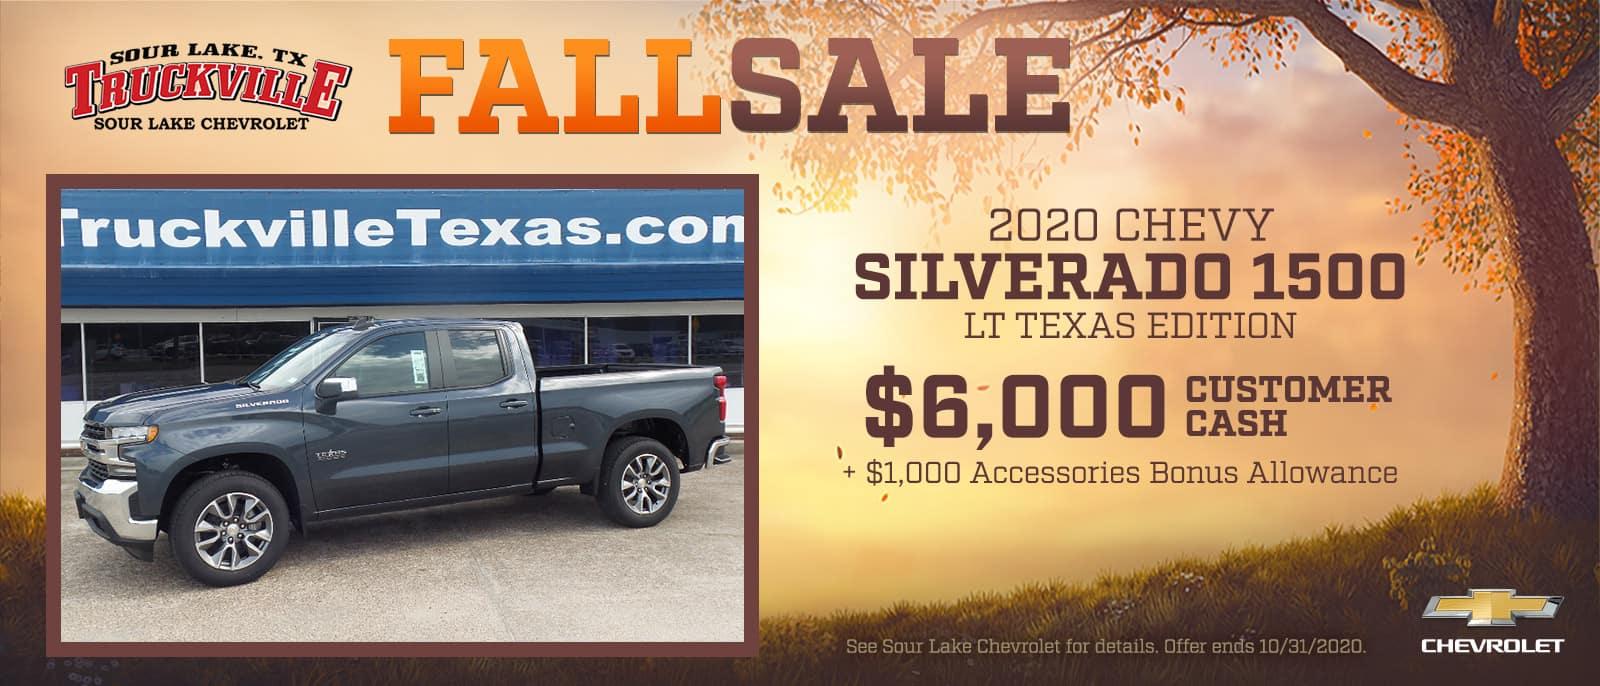 2020 Chevrolet Silverado 1500 Fall Sale Event | Sour Lake, TX